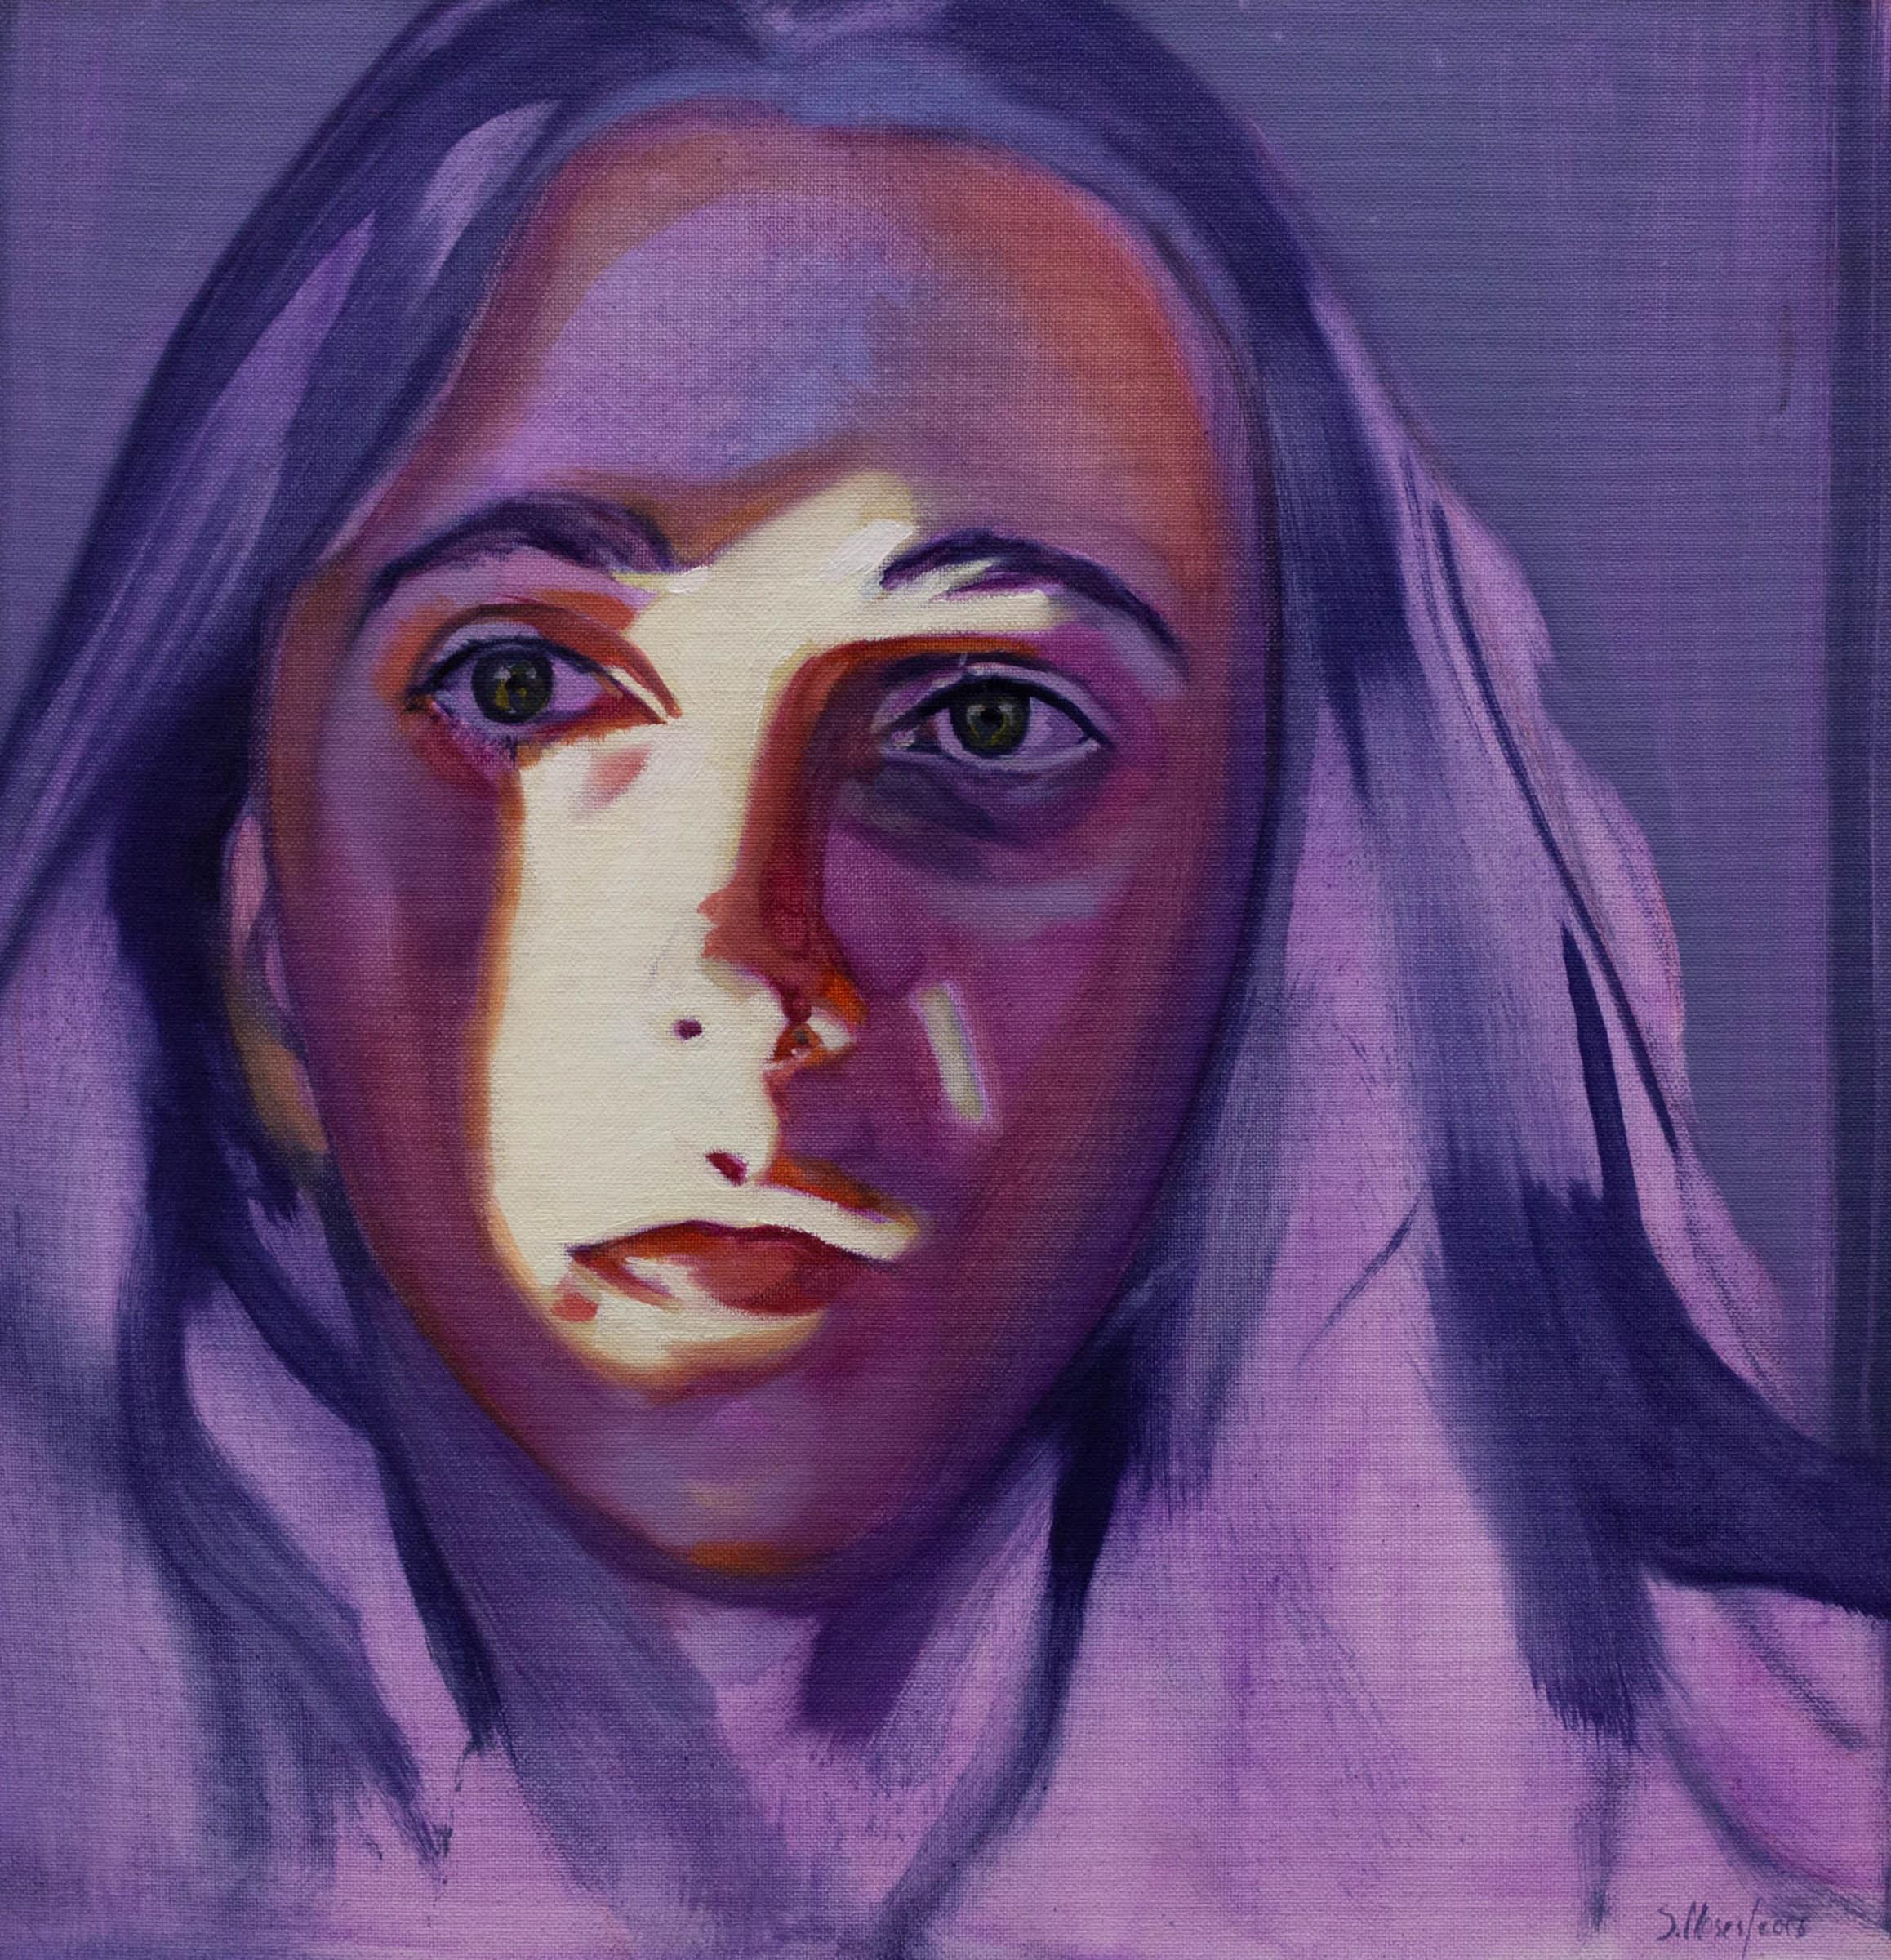 <span class=&#34;link fancybox-details-link&#34;><a href=&#34;/artworks/categories/120/1171-sharon-moses-catching-light-2018/&#34;>View Detail Page</a></span><div class=&#34;artist&#34;><strong>Sharon Moses</strong></div> <div class=&#34;title&#34;><em>Catching Light</em>, 2018</div> <div class=&#34;medium&#34;>Oil On Canvas</div> <div class=&#34;dimensions&#34;>45.7cm x 45.7cm</div><div class=&#34;price&#34;>R7,200.00</div>